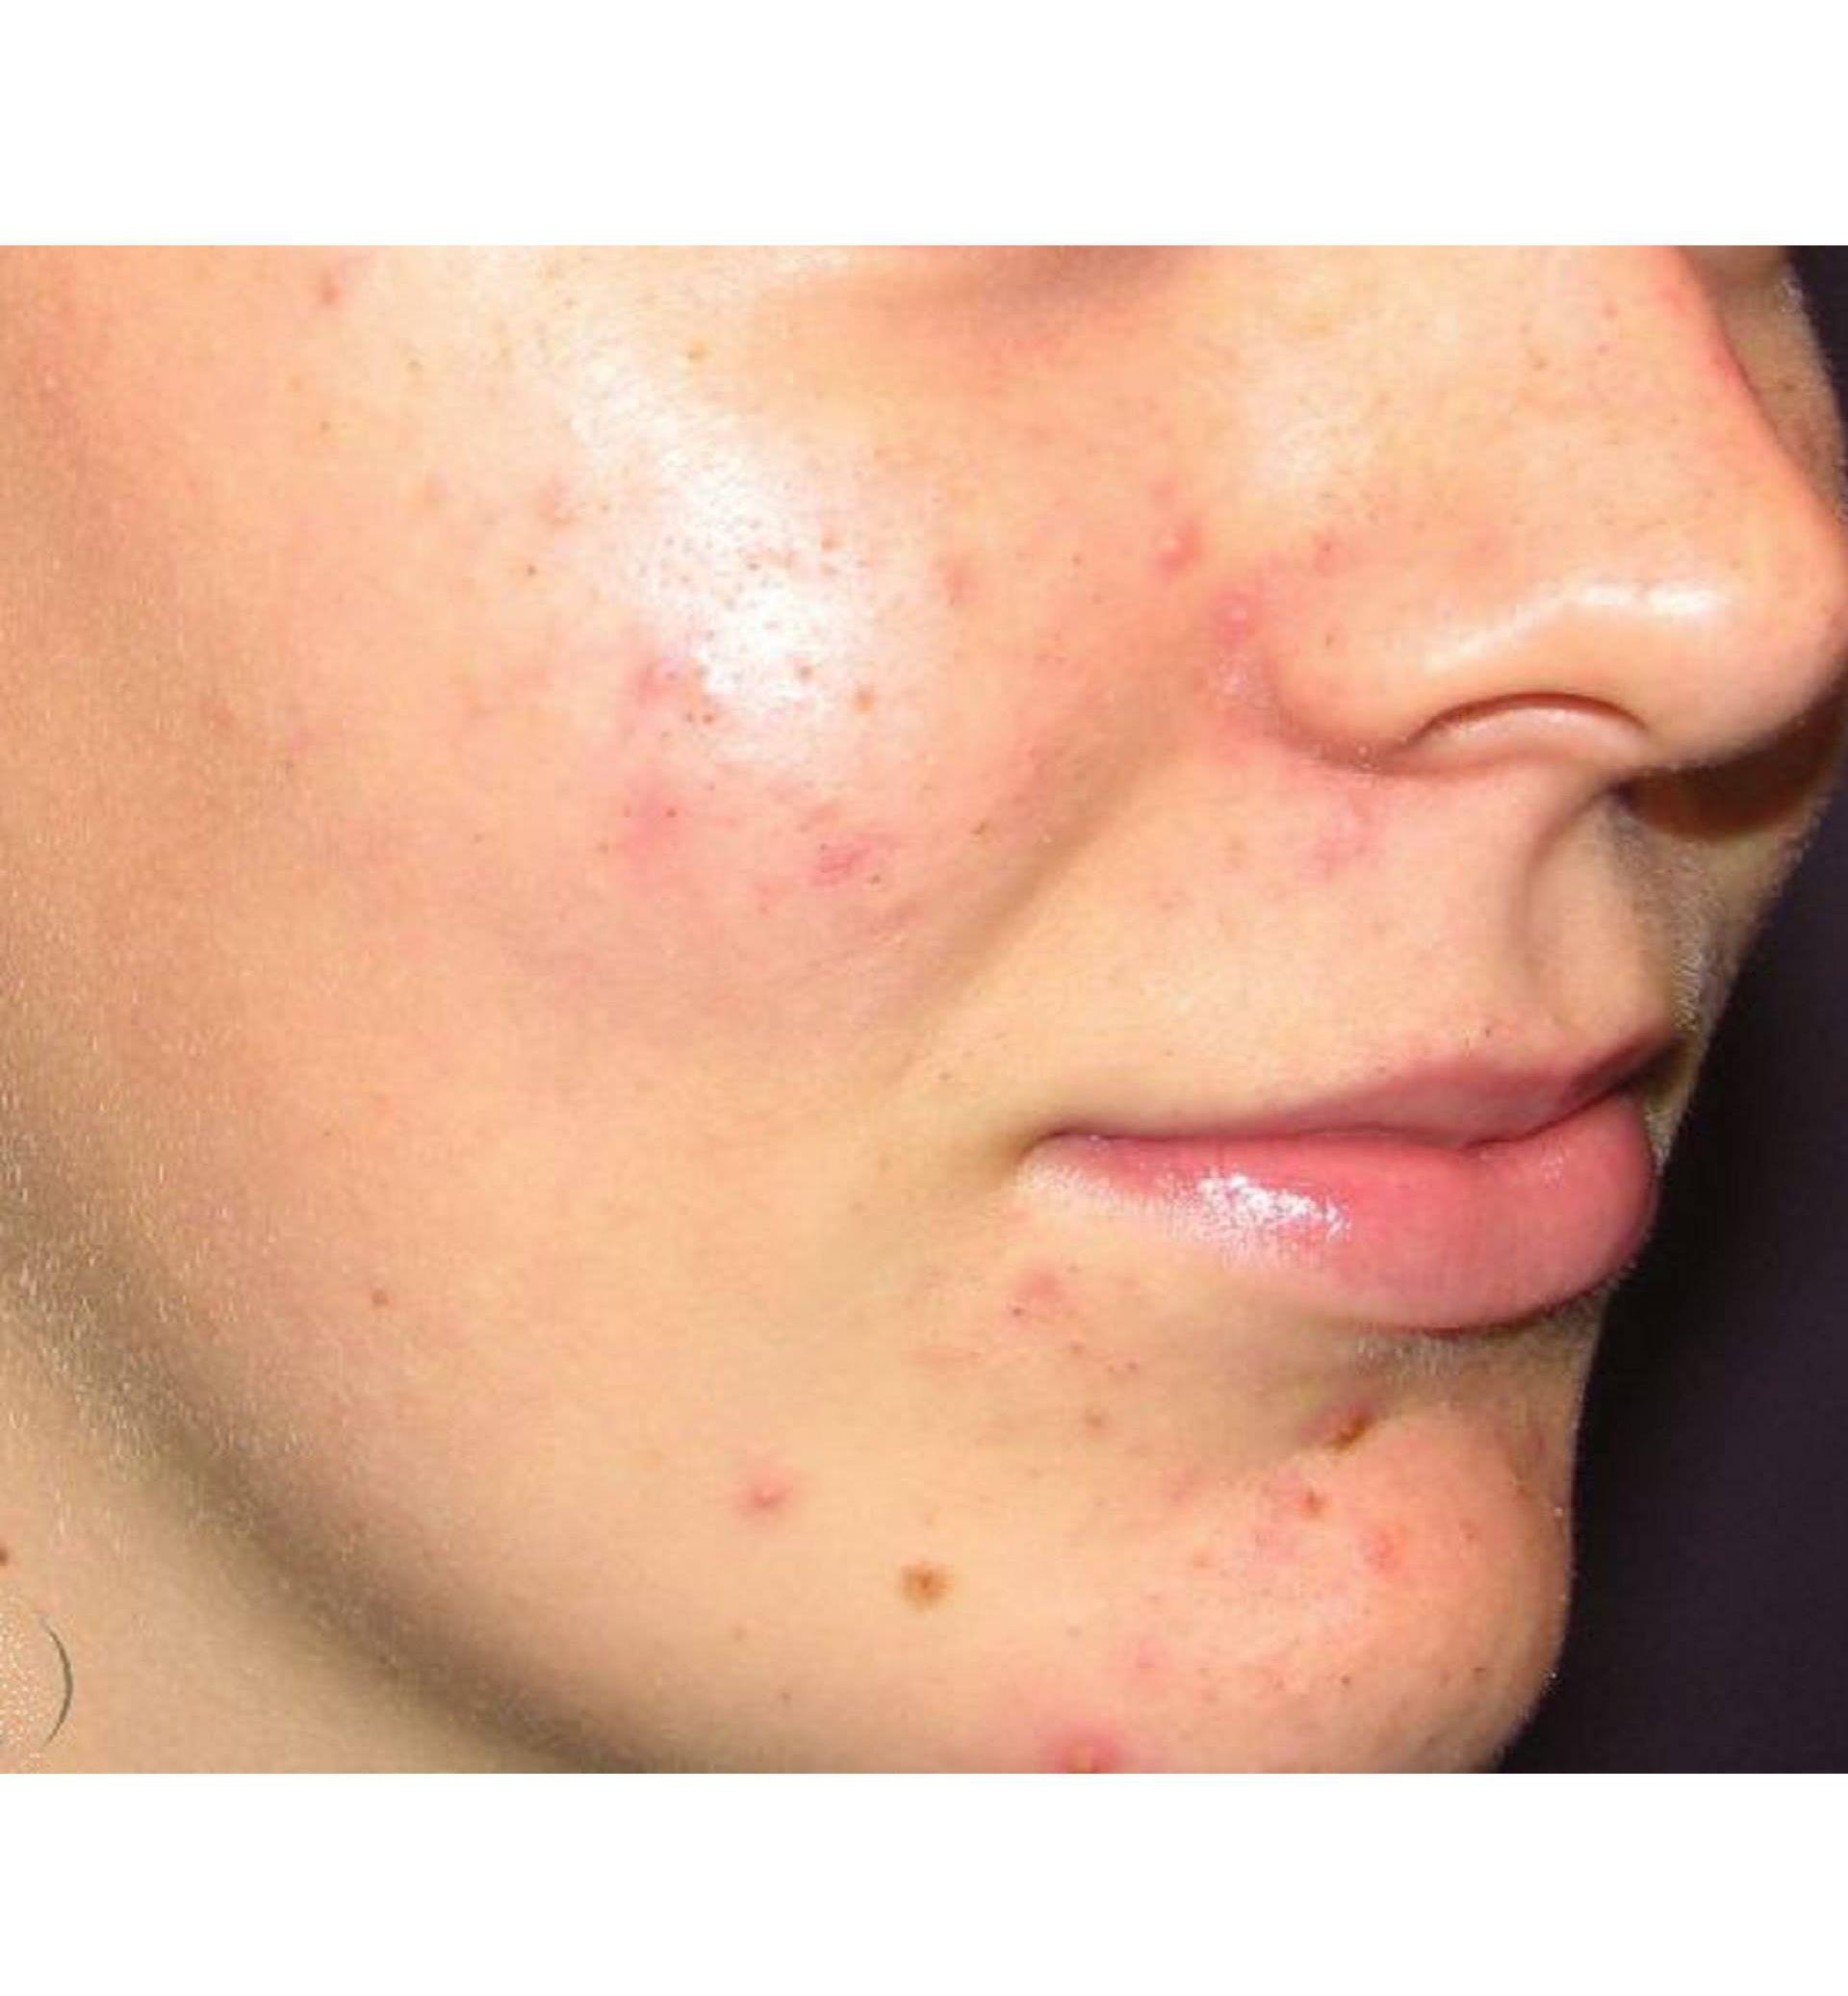 acne vulgaris dermnet nz - HD1920×1588